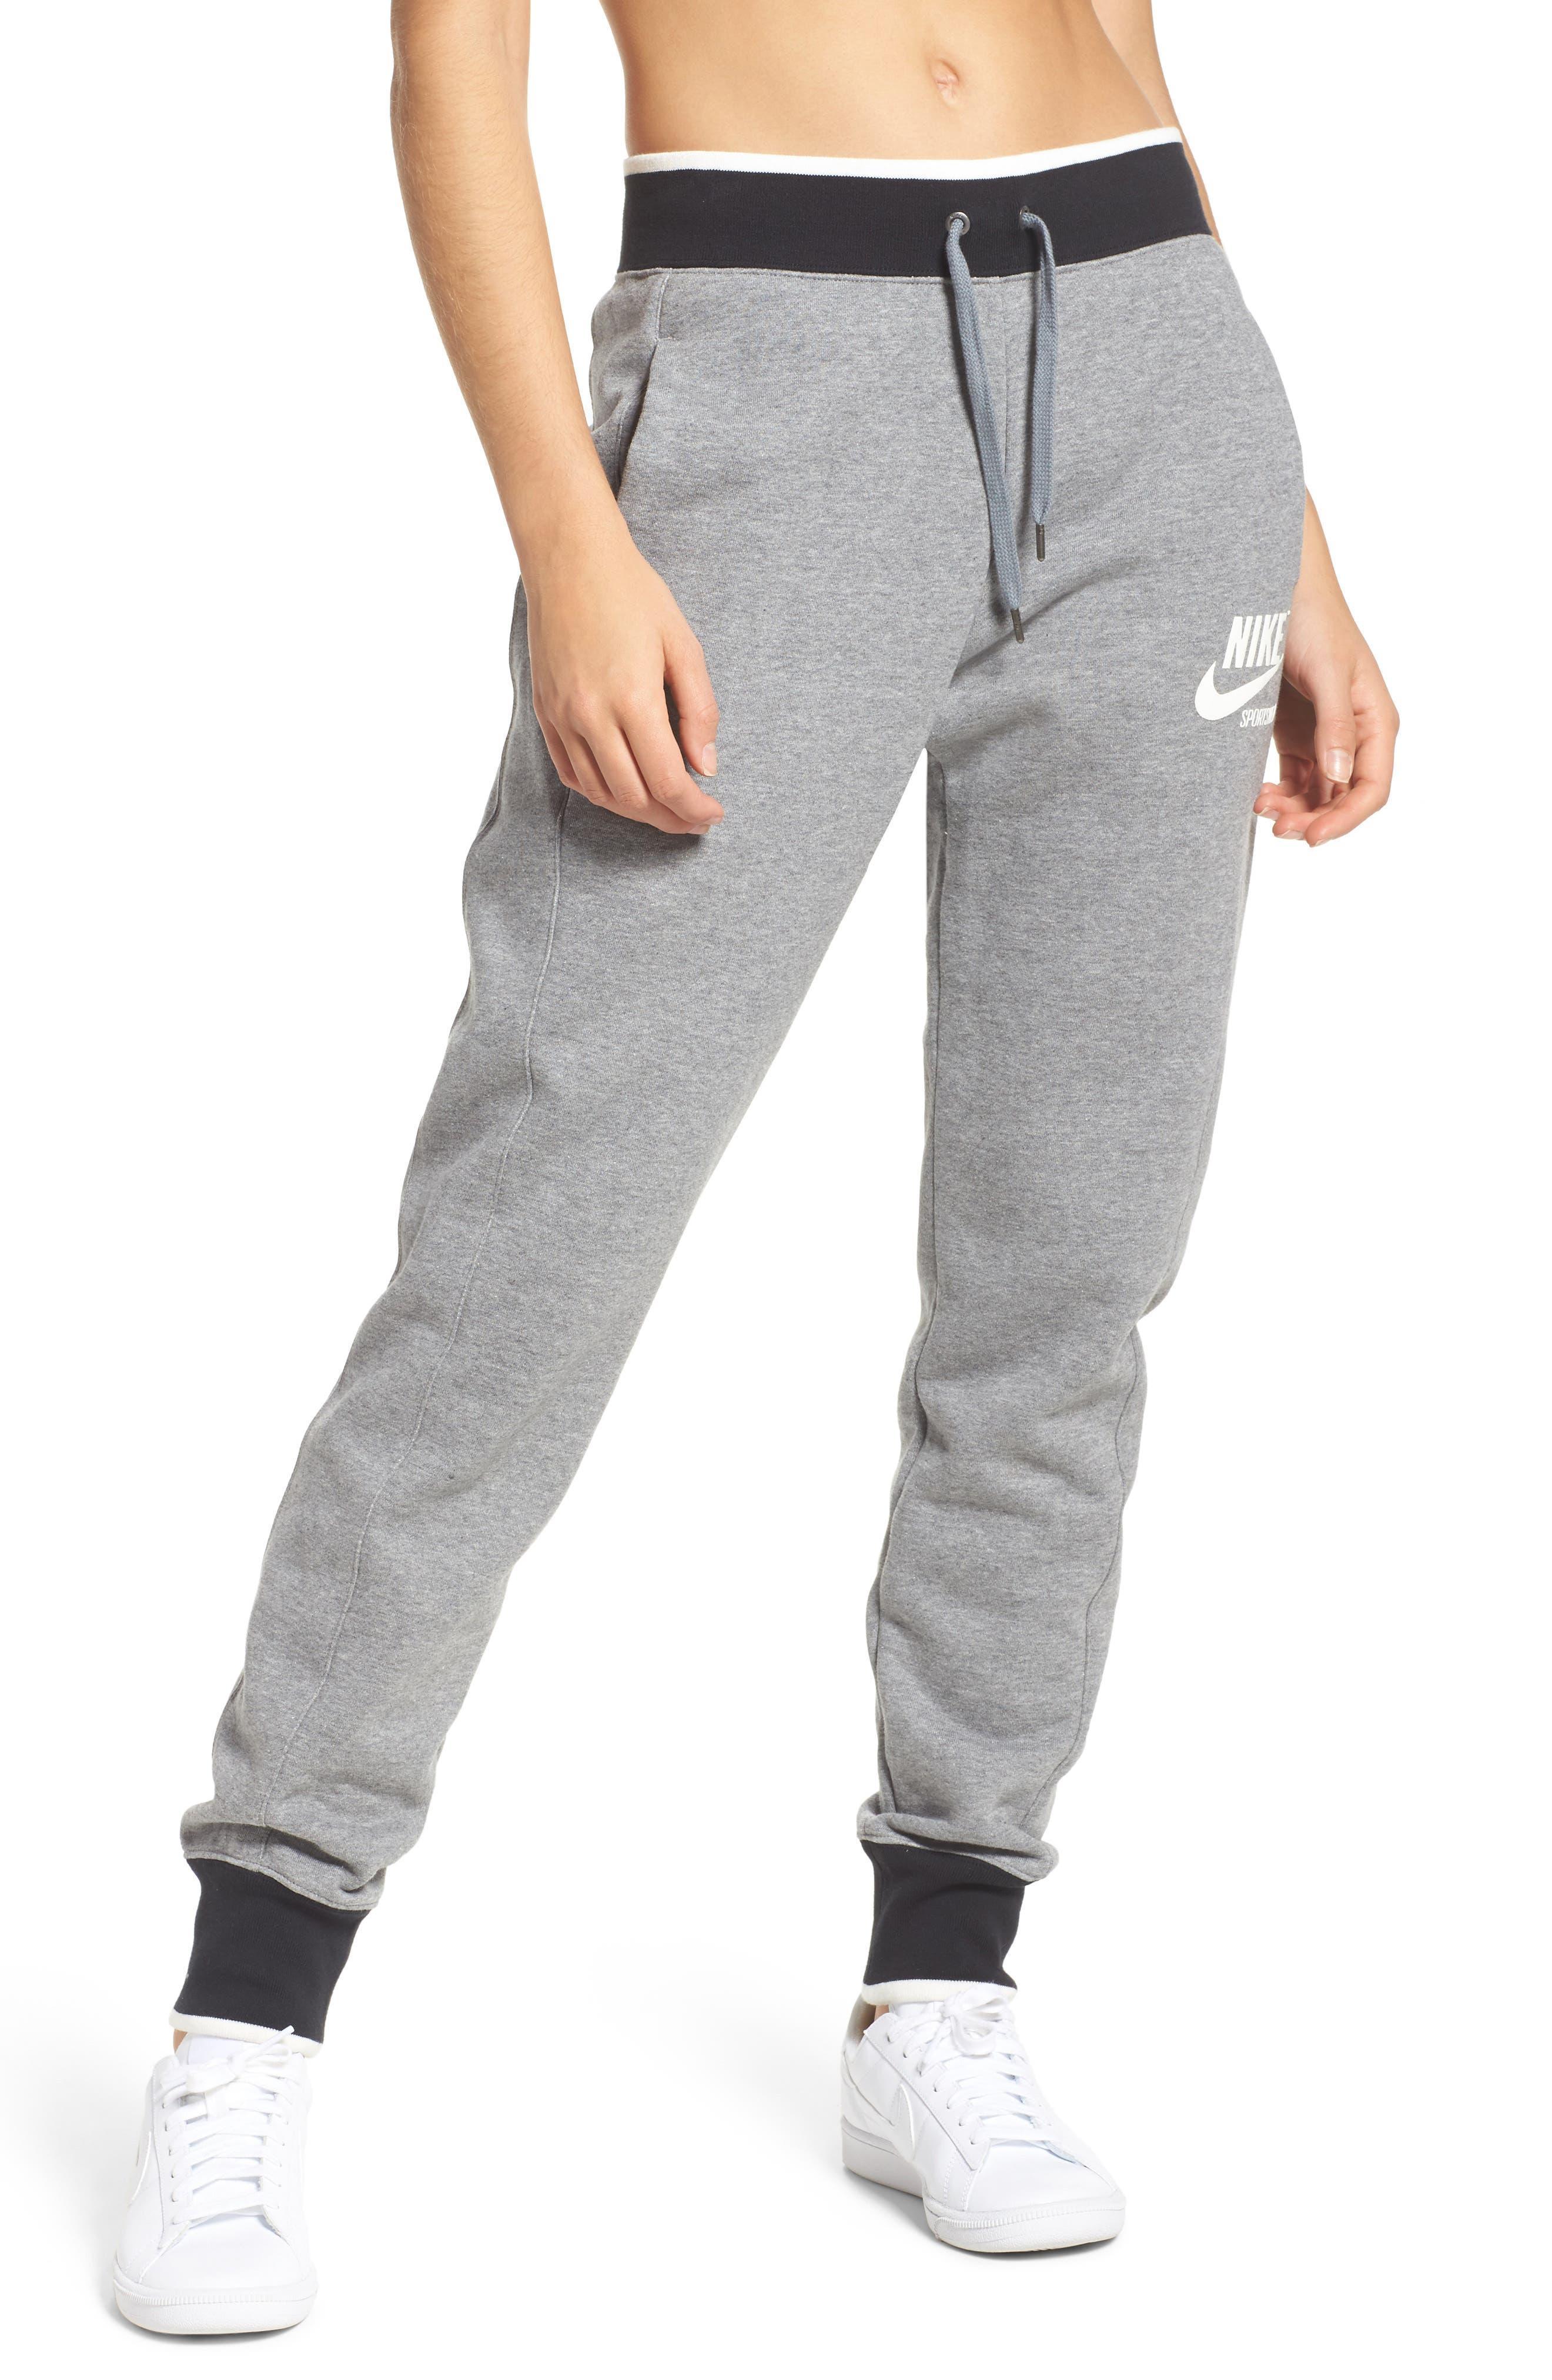 Fleece Knit Pants,                         Main,                         color, Carbon Heather/ Outdoor Green